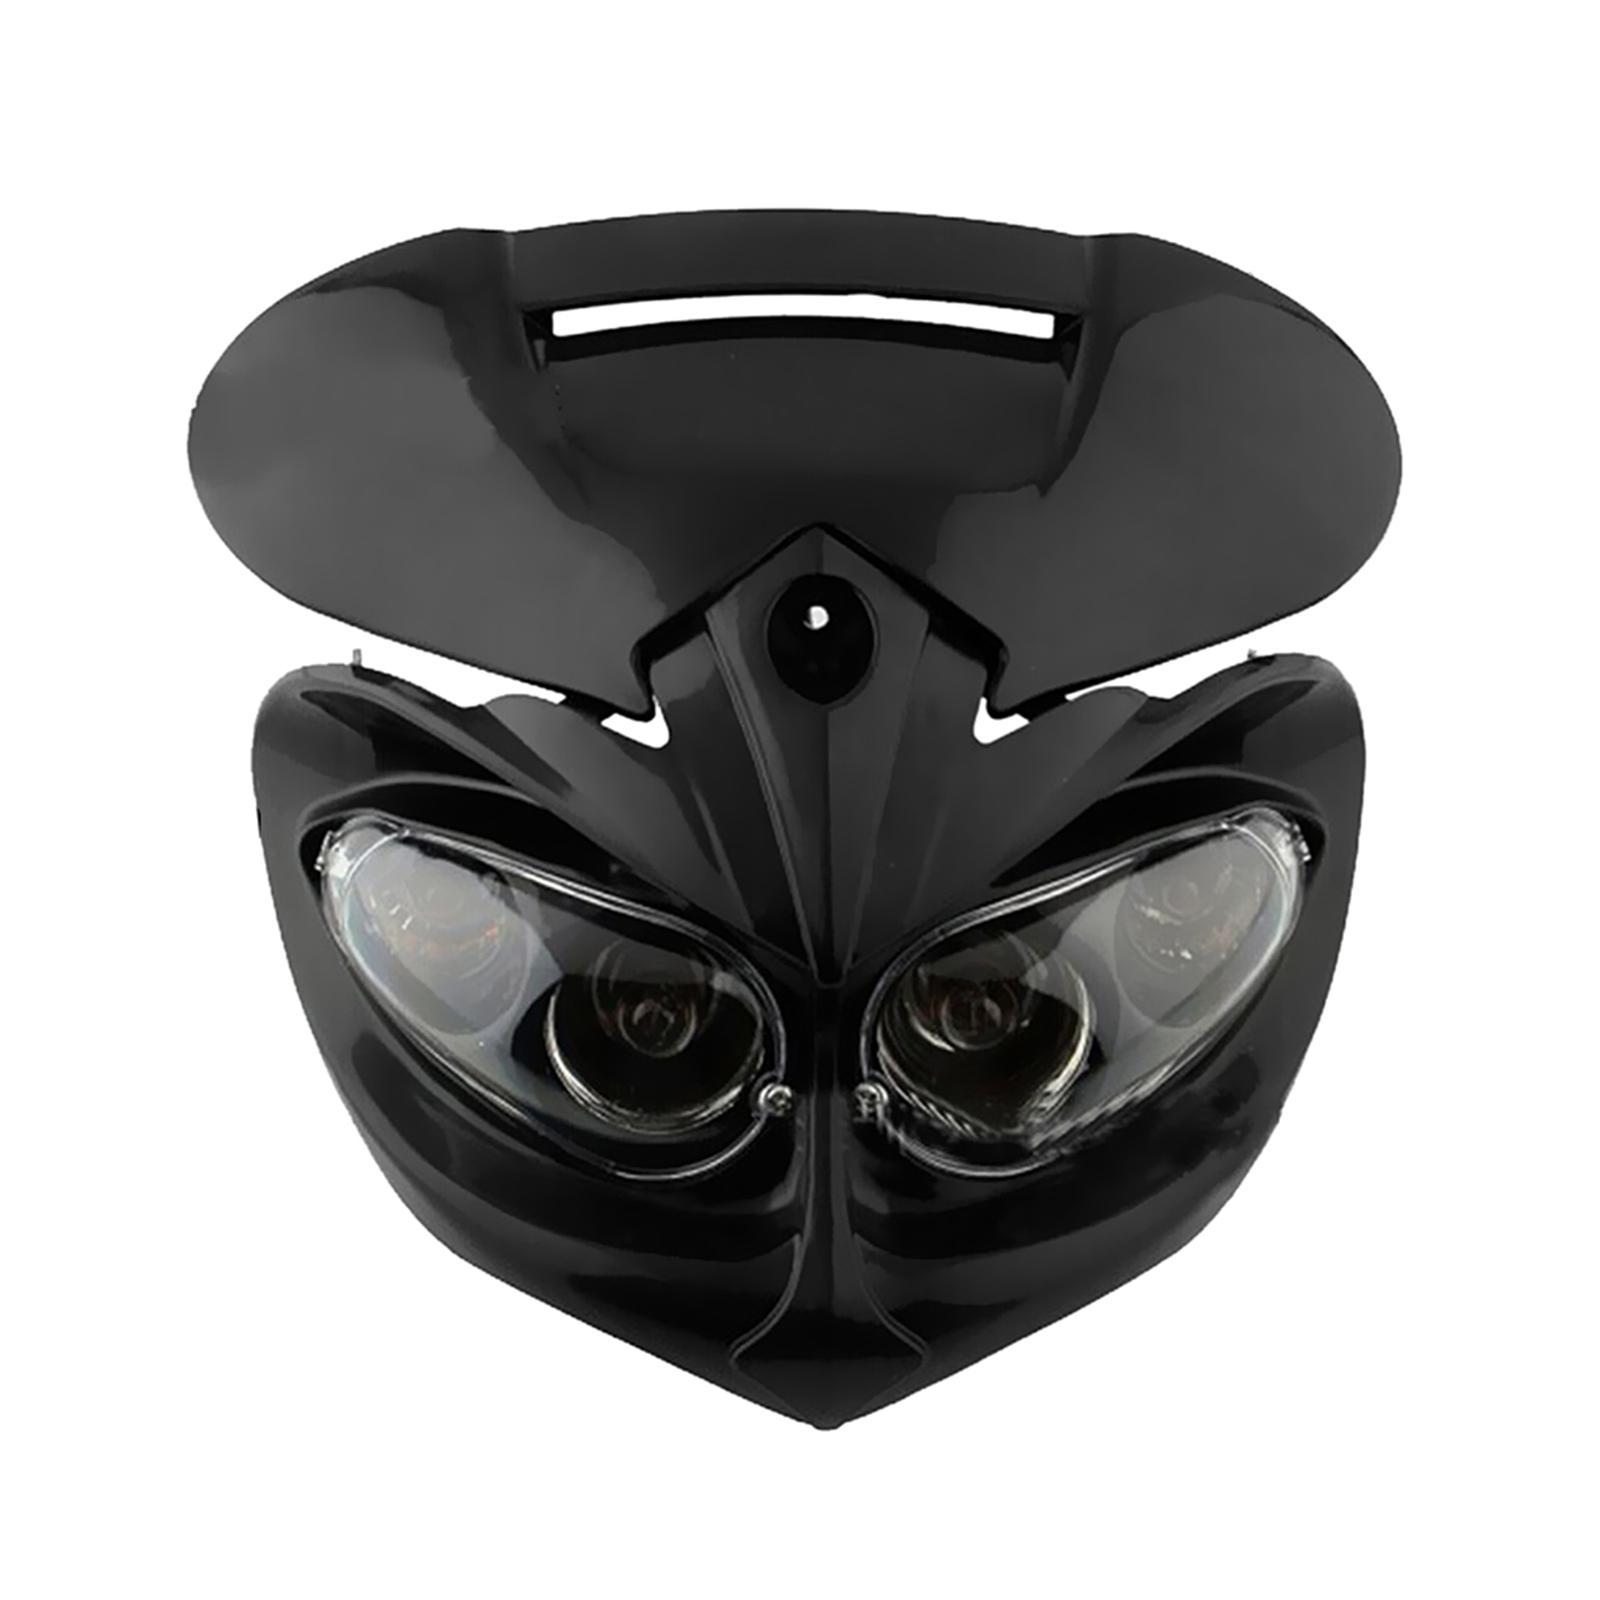 12V Universal for Motorcycle Head Lamp Fairing Headlight Mask